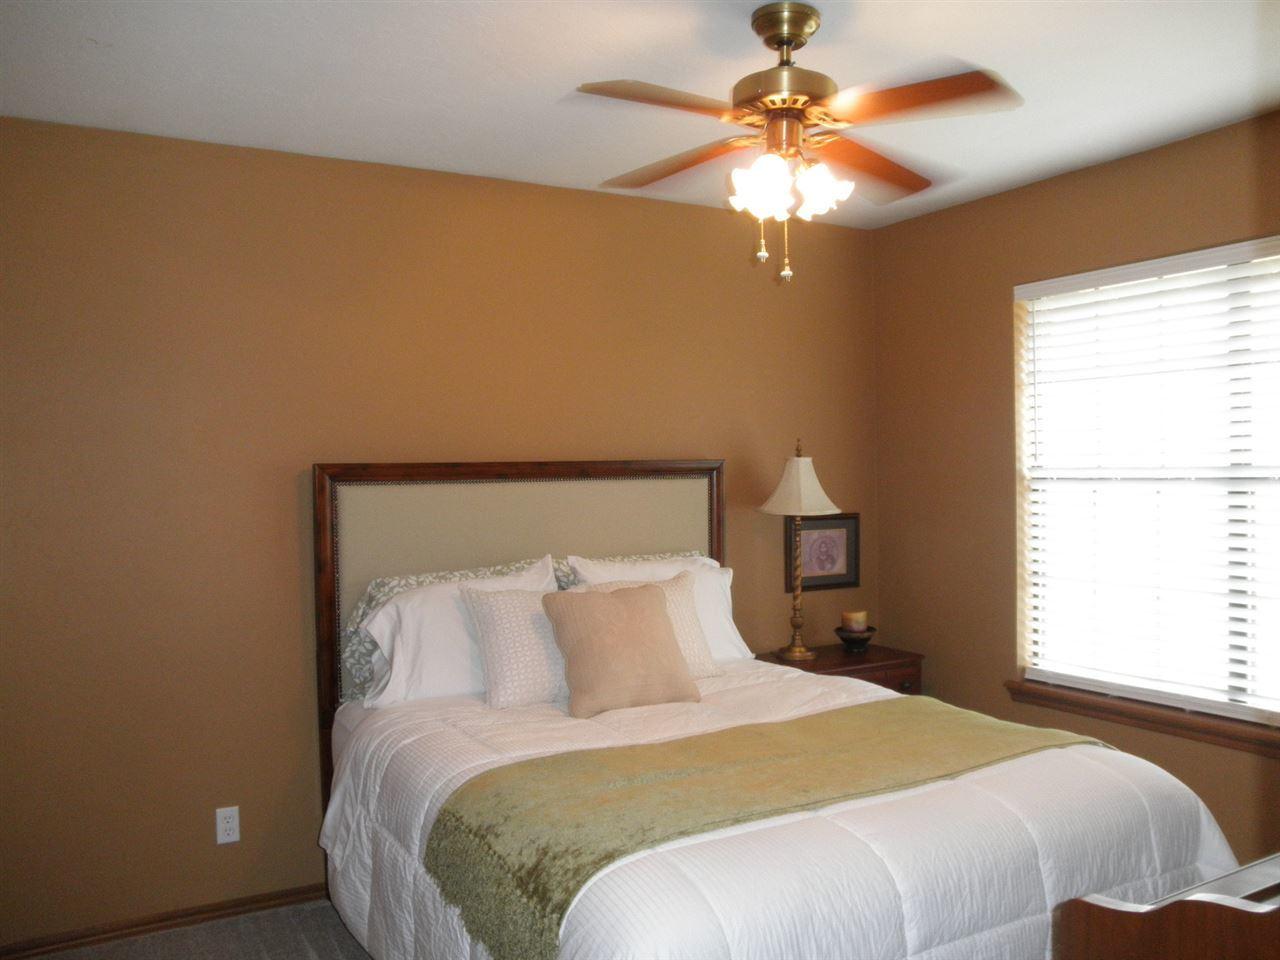 Sold Intraoffice W/MLS | 2800 Green Meadow Ponca City, OK 74604 18